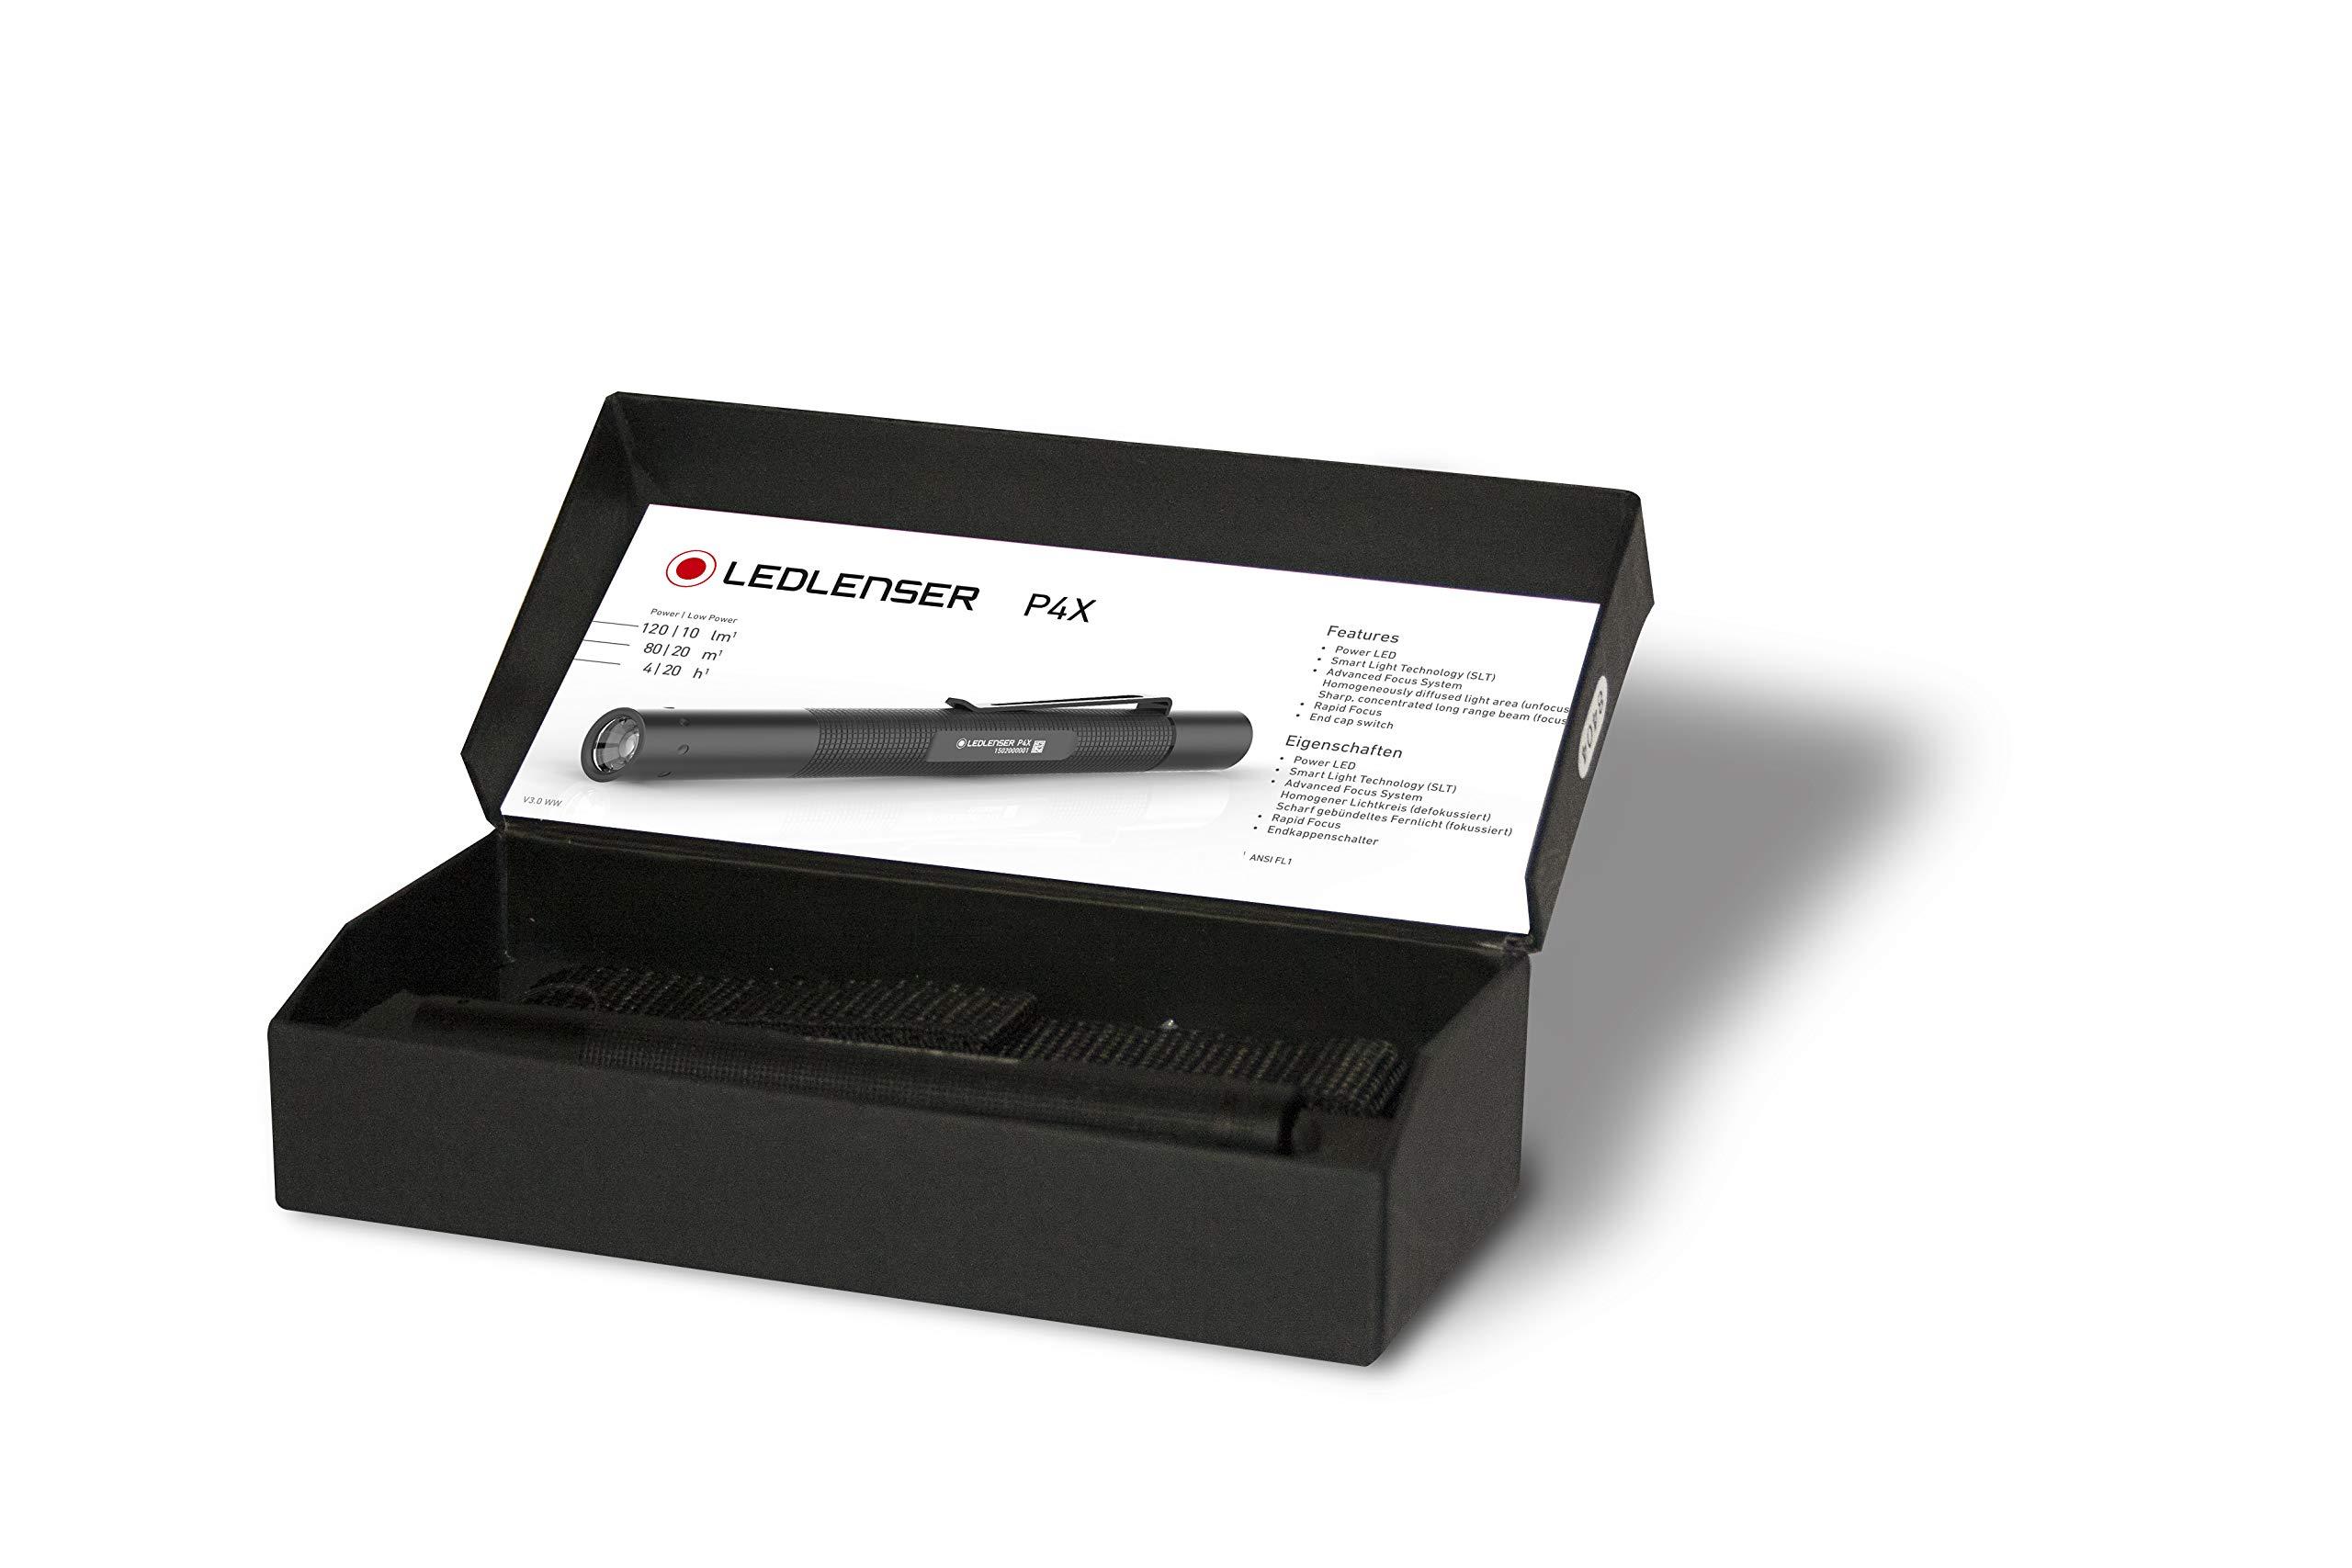 Negro Zweibr/üder X LED Linterna cea5/W nser P4/X S